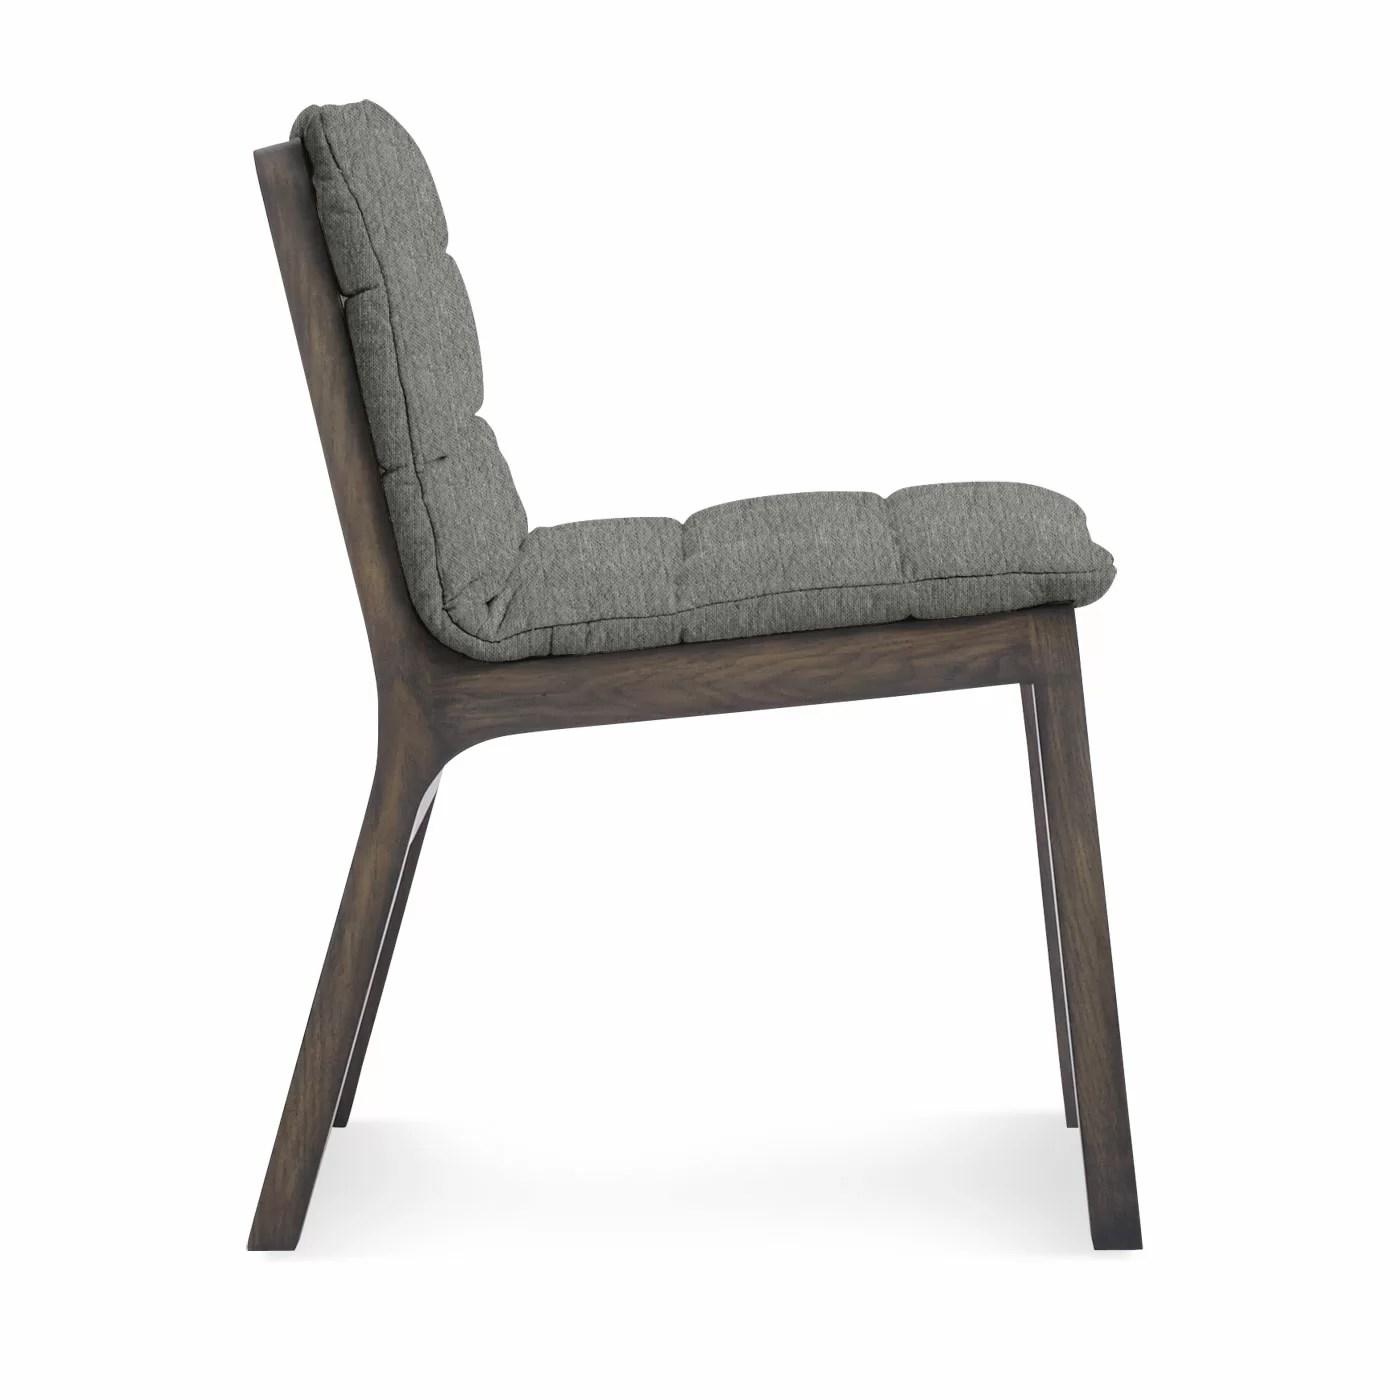 blu dot chairs barber chair repair uk wicket and reviews wayfair